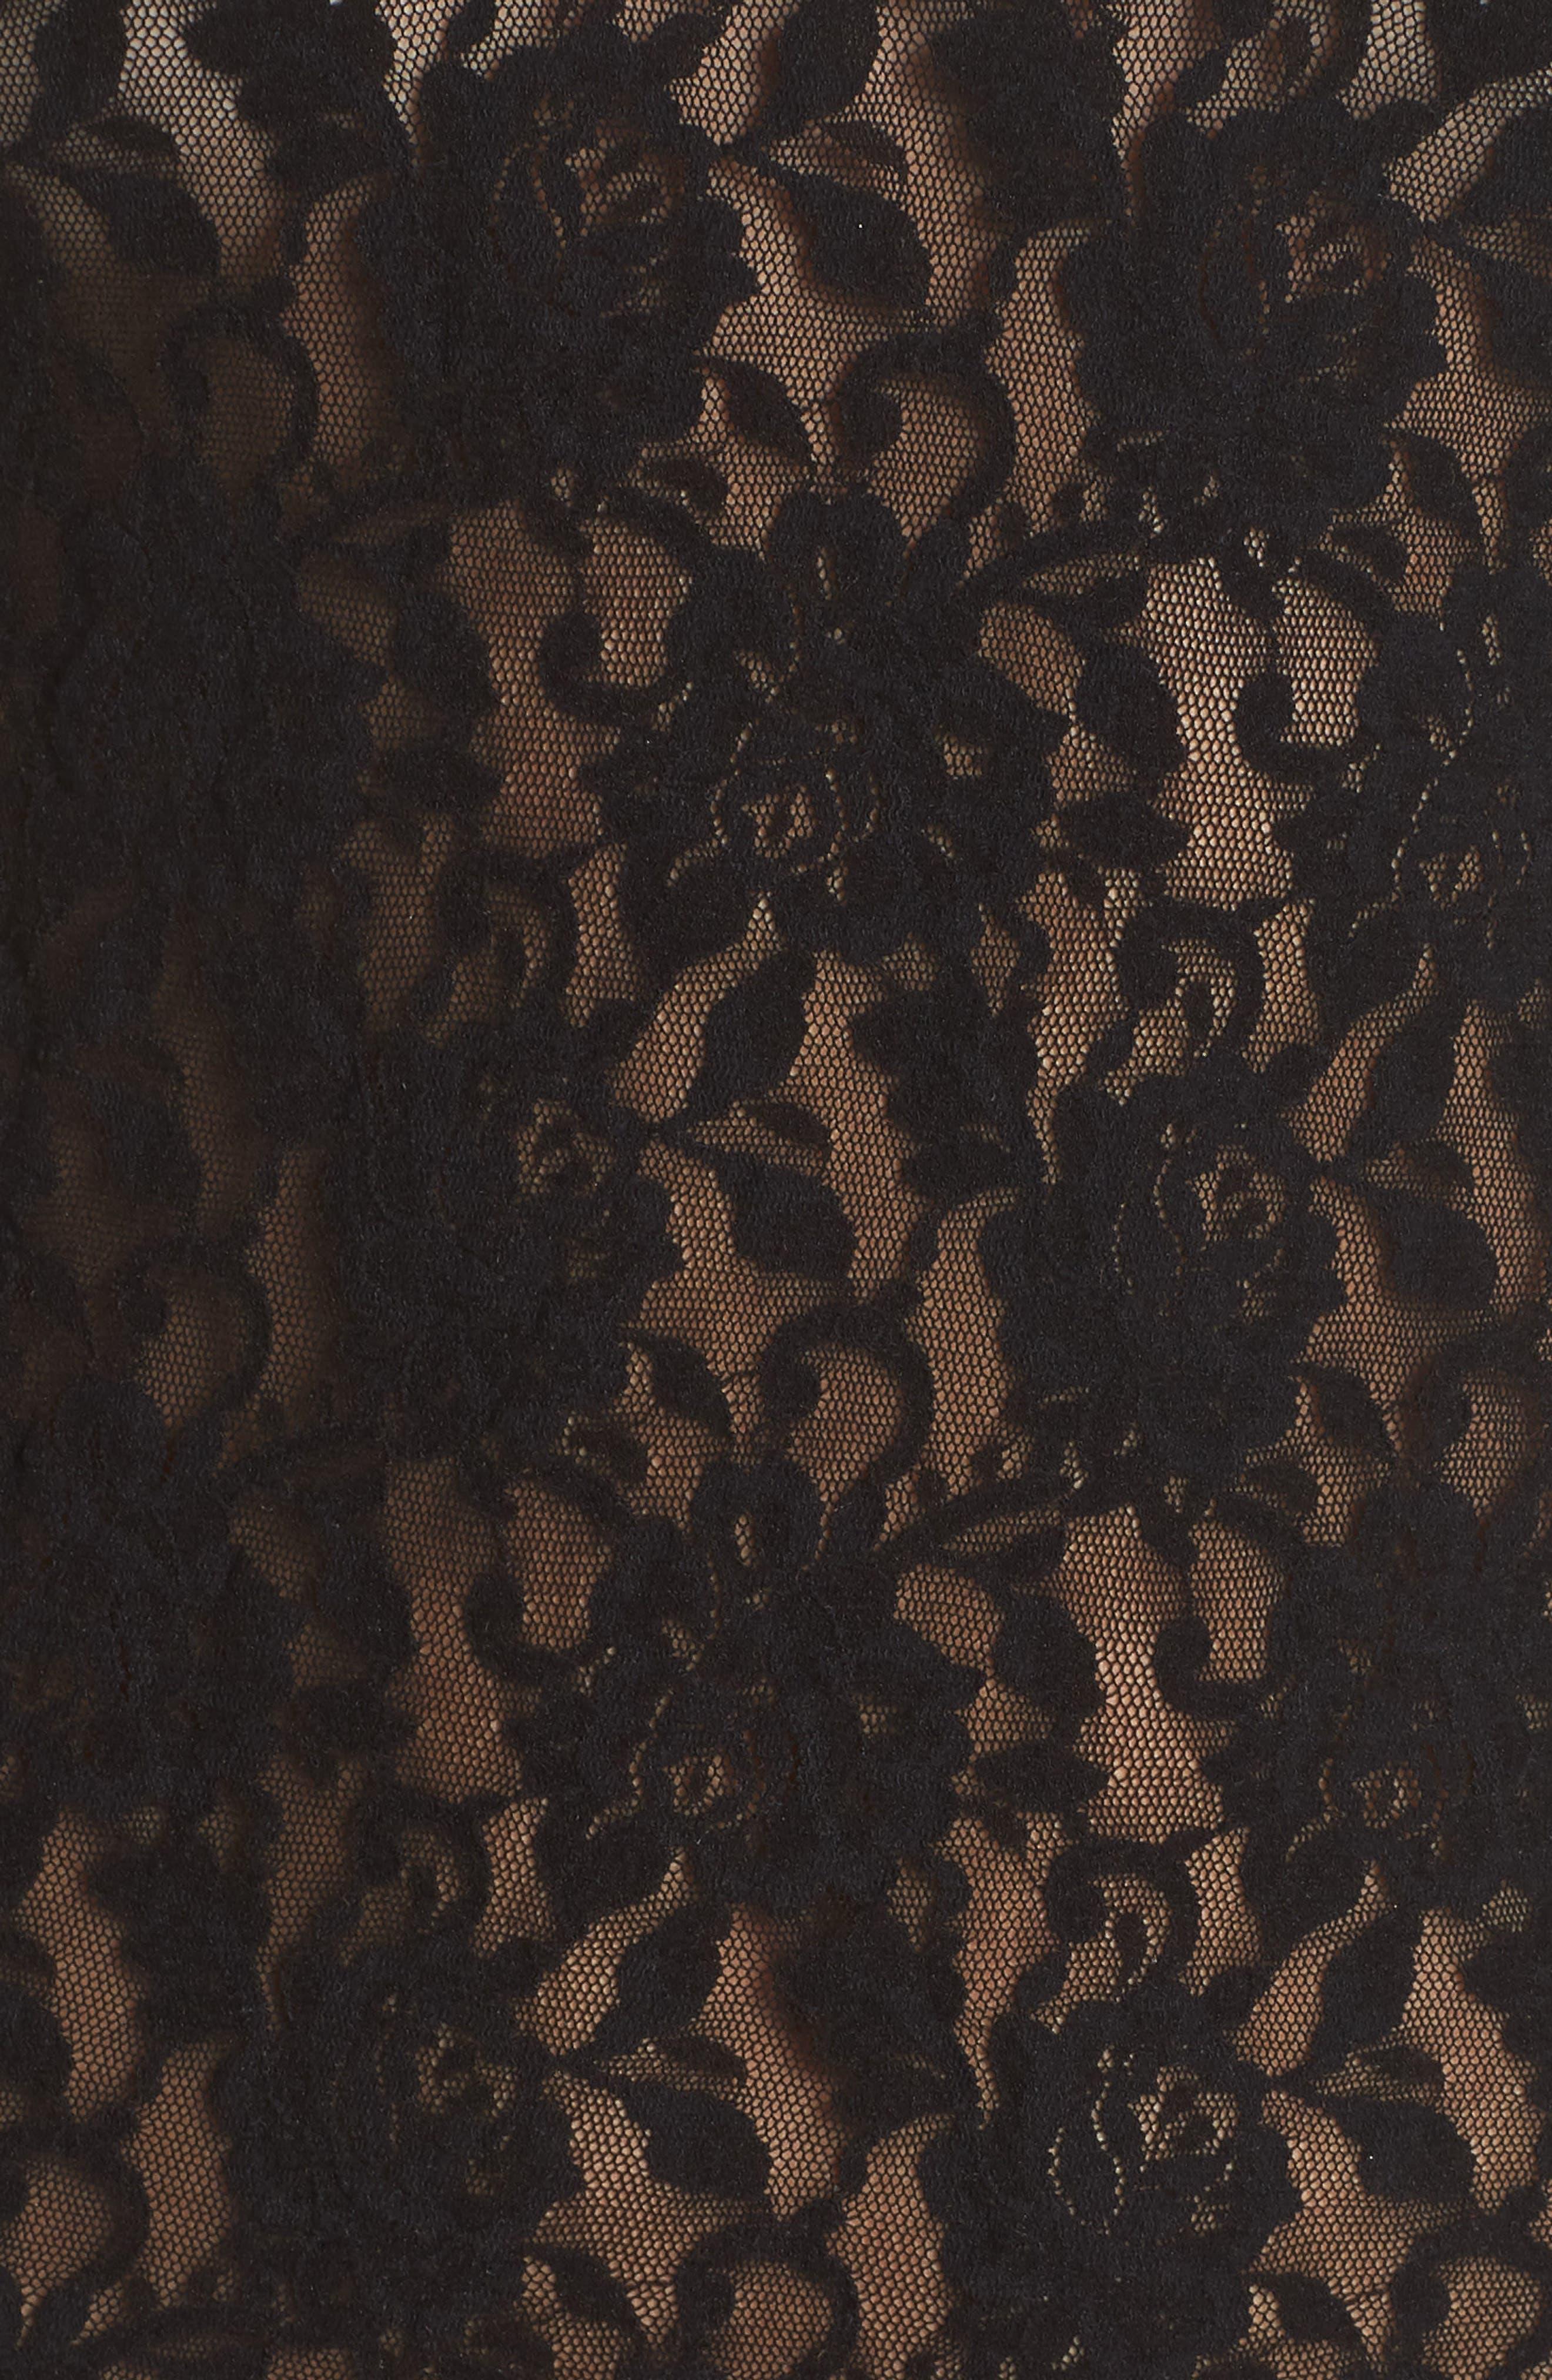 HANKY PANKY, Signature Lace 2-Way Top, Alternate thumbnail 6, color, 001